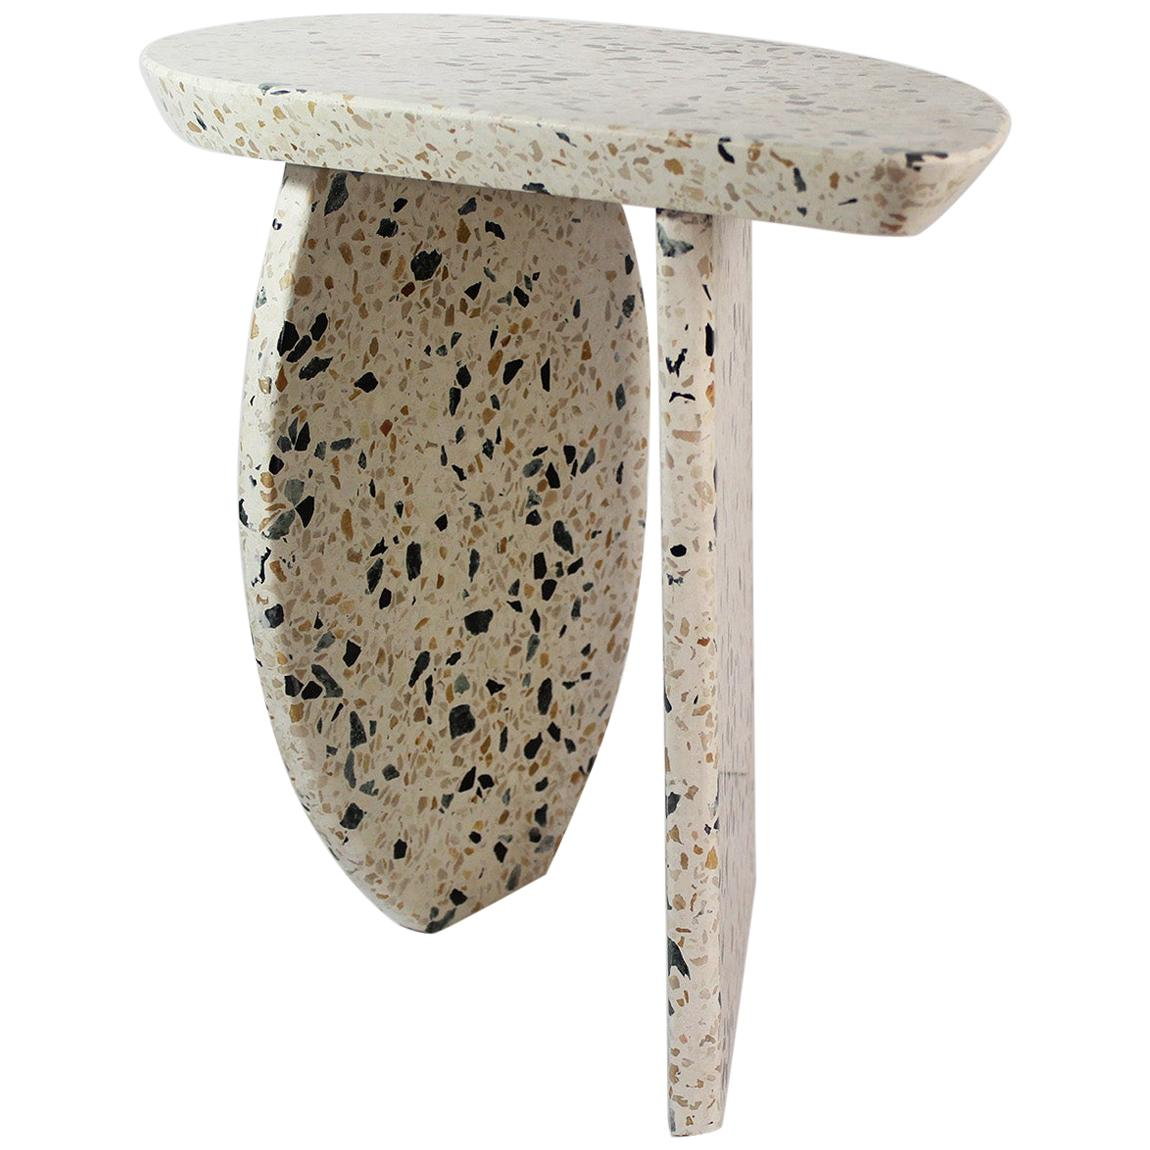 Bespoke Organic Side Table Handmade in Granito Terrazzo in Stock Design E Gizard